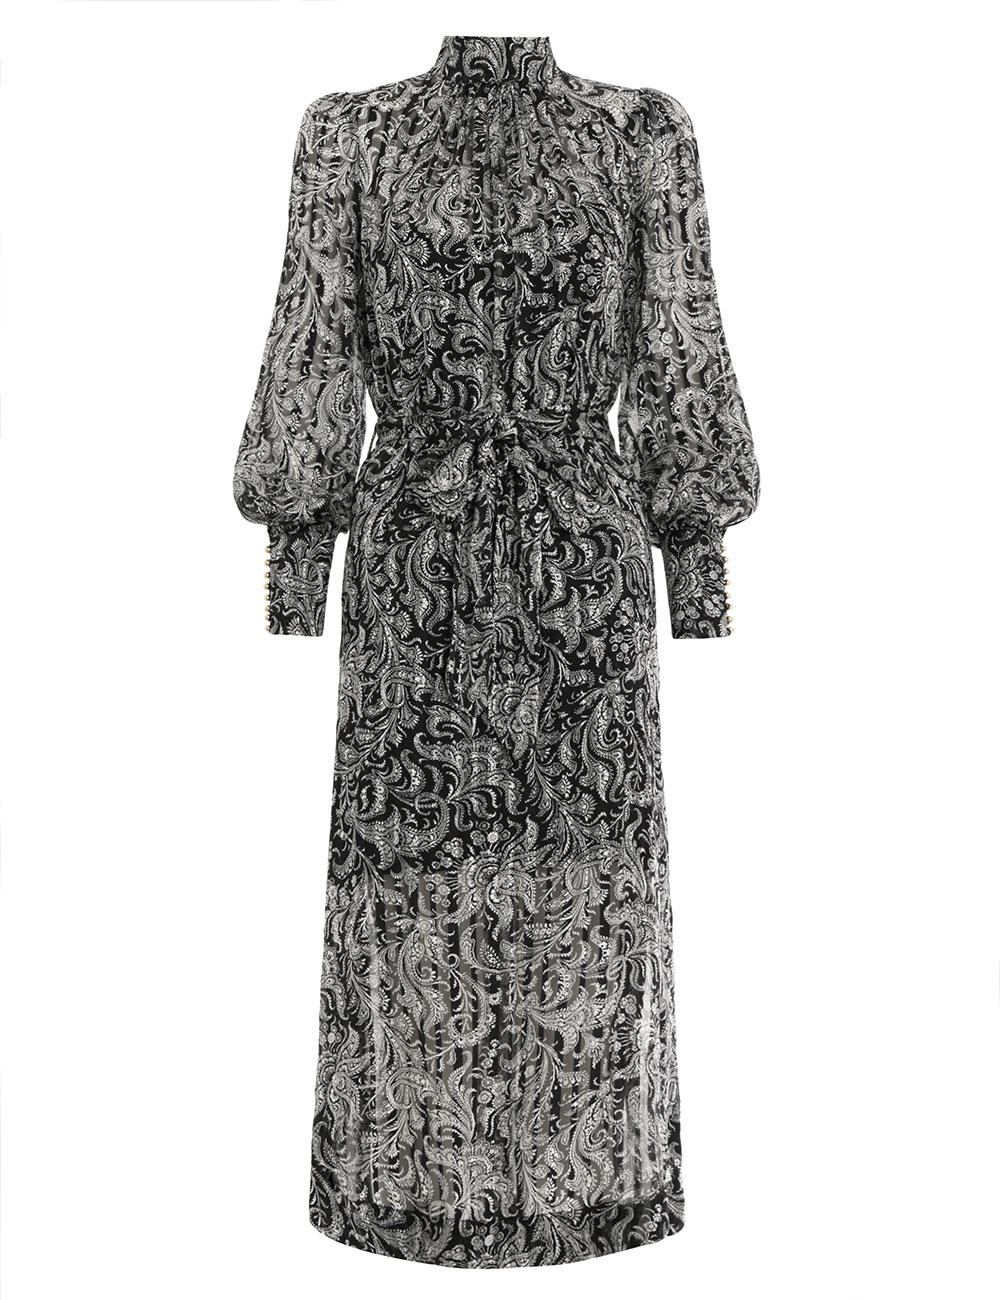 Ninety-Six High Neck Dress